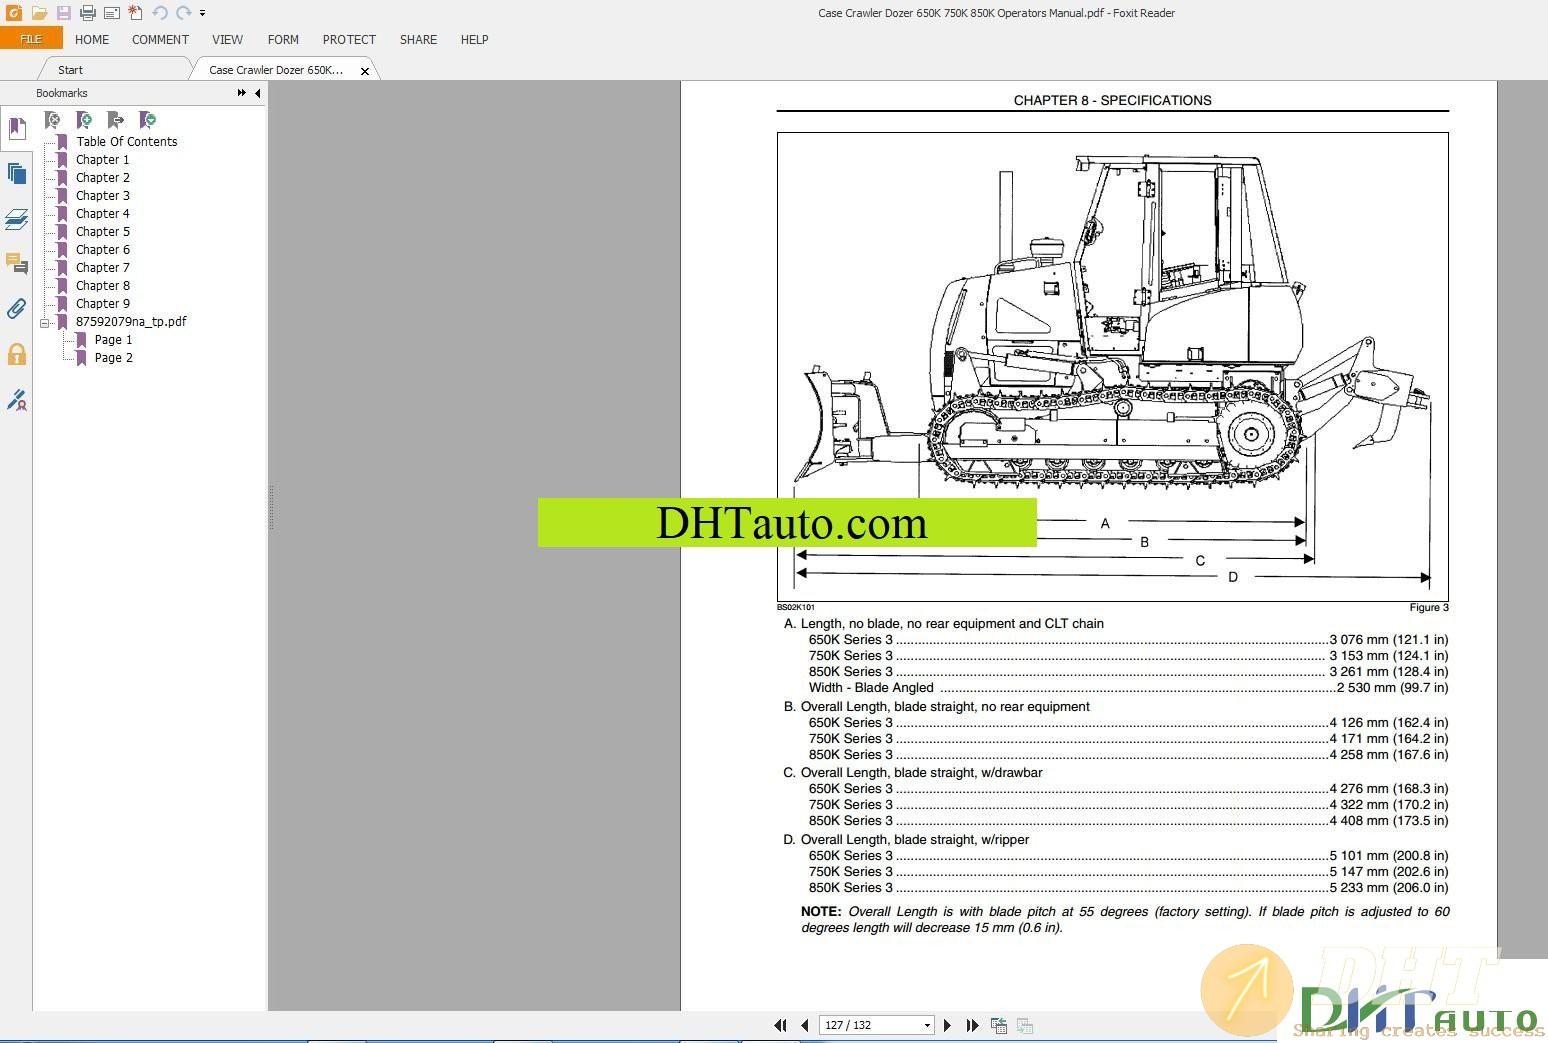 Case Crawler Dozer Operators & Service Manual 9.jpg